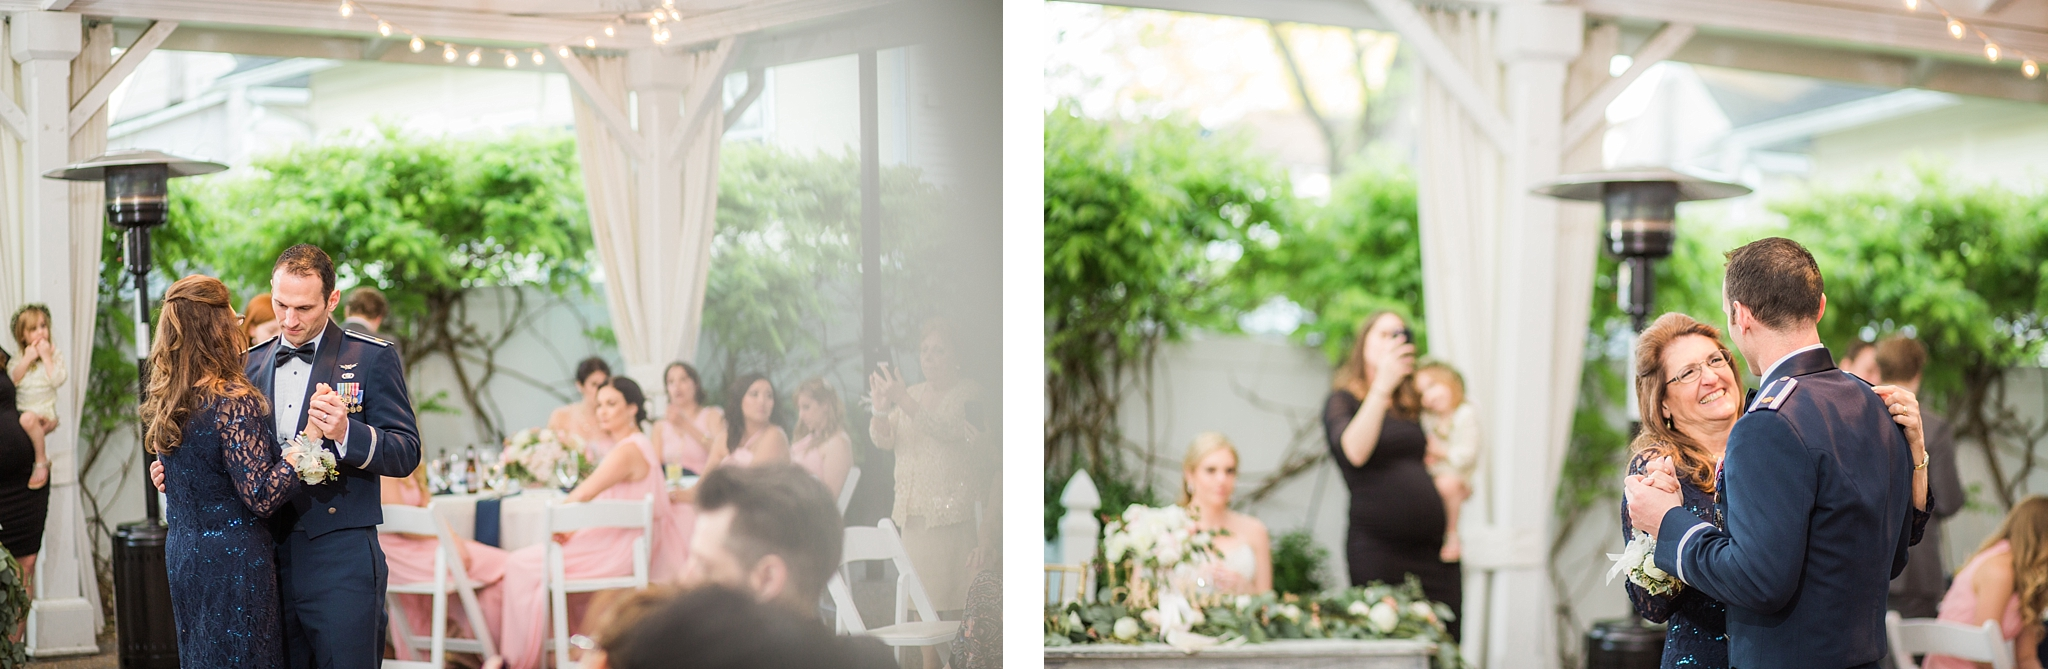 caley-newberry-wedding-photographer.jpg